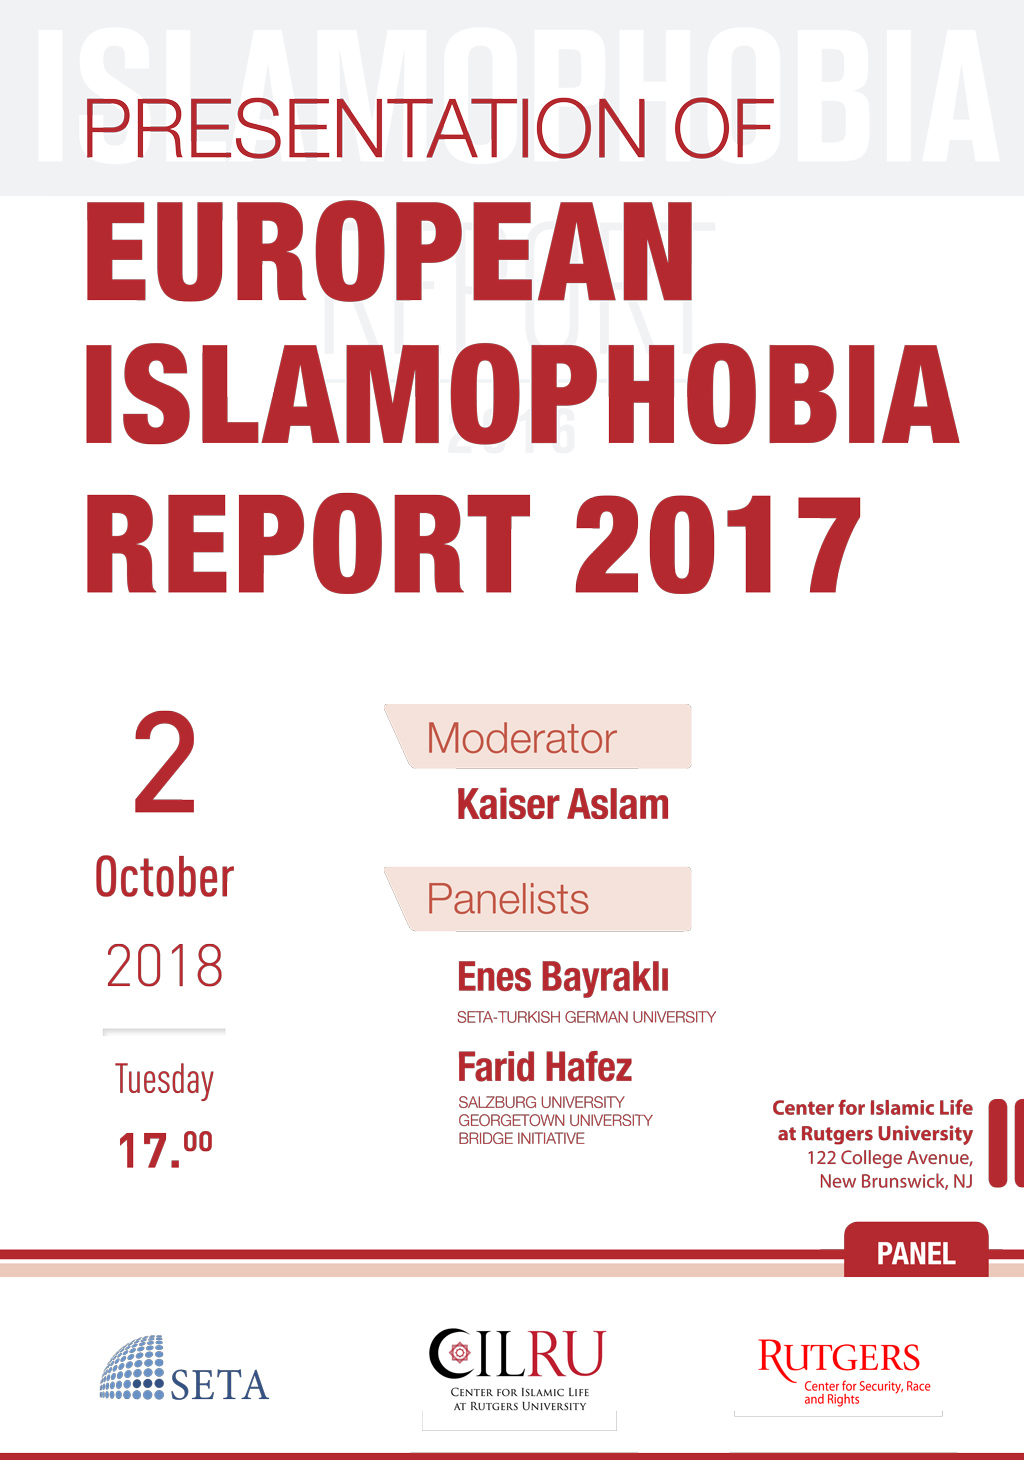 Presentation of European Islamophobia Report 2017